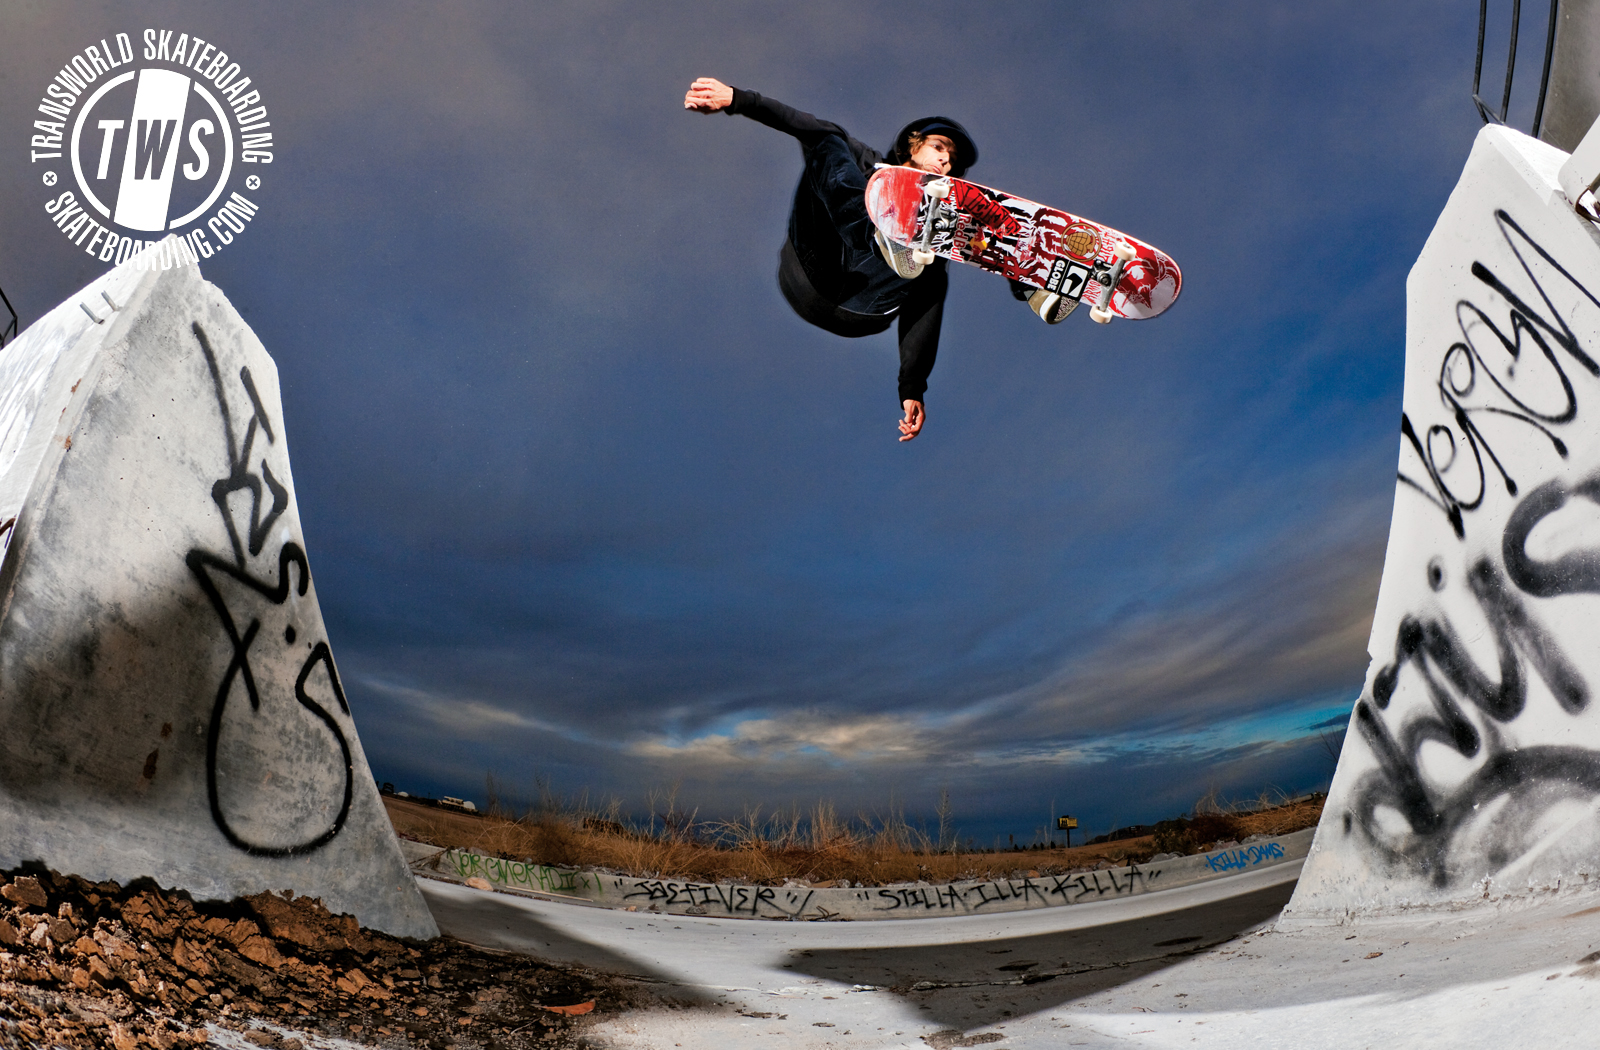 Skateboarding Wallpaper HD wallpapers   Jump Skateboarding Wallpaper 1600x1050